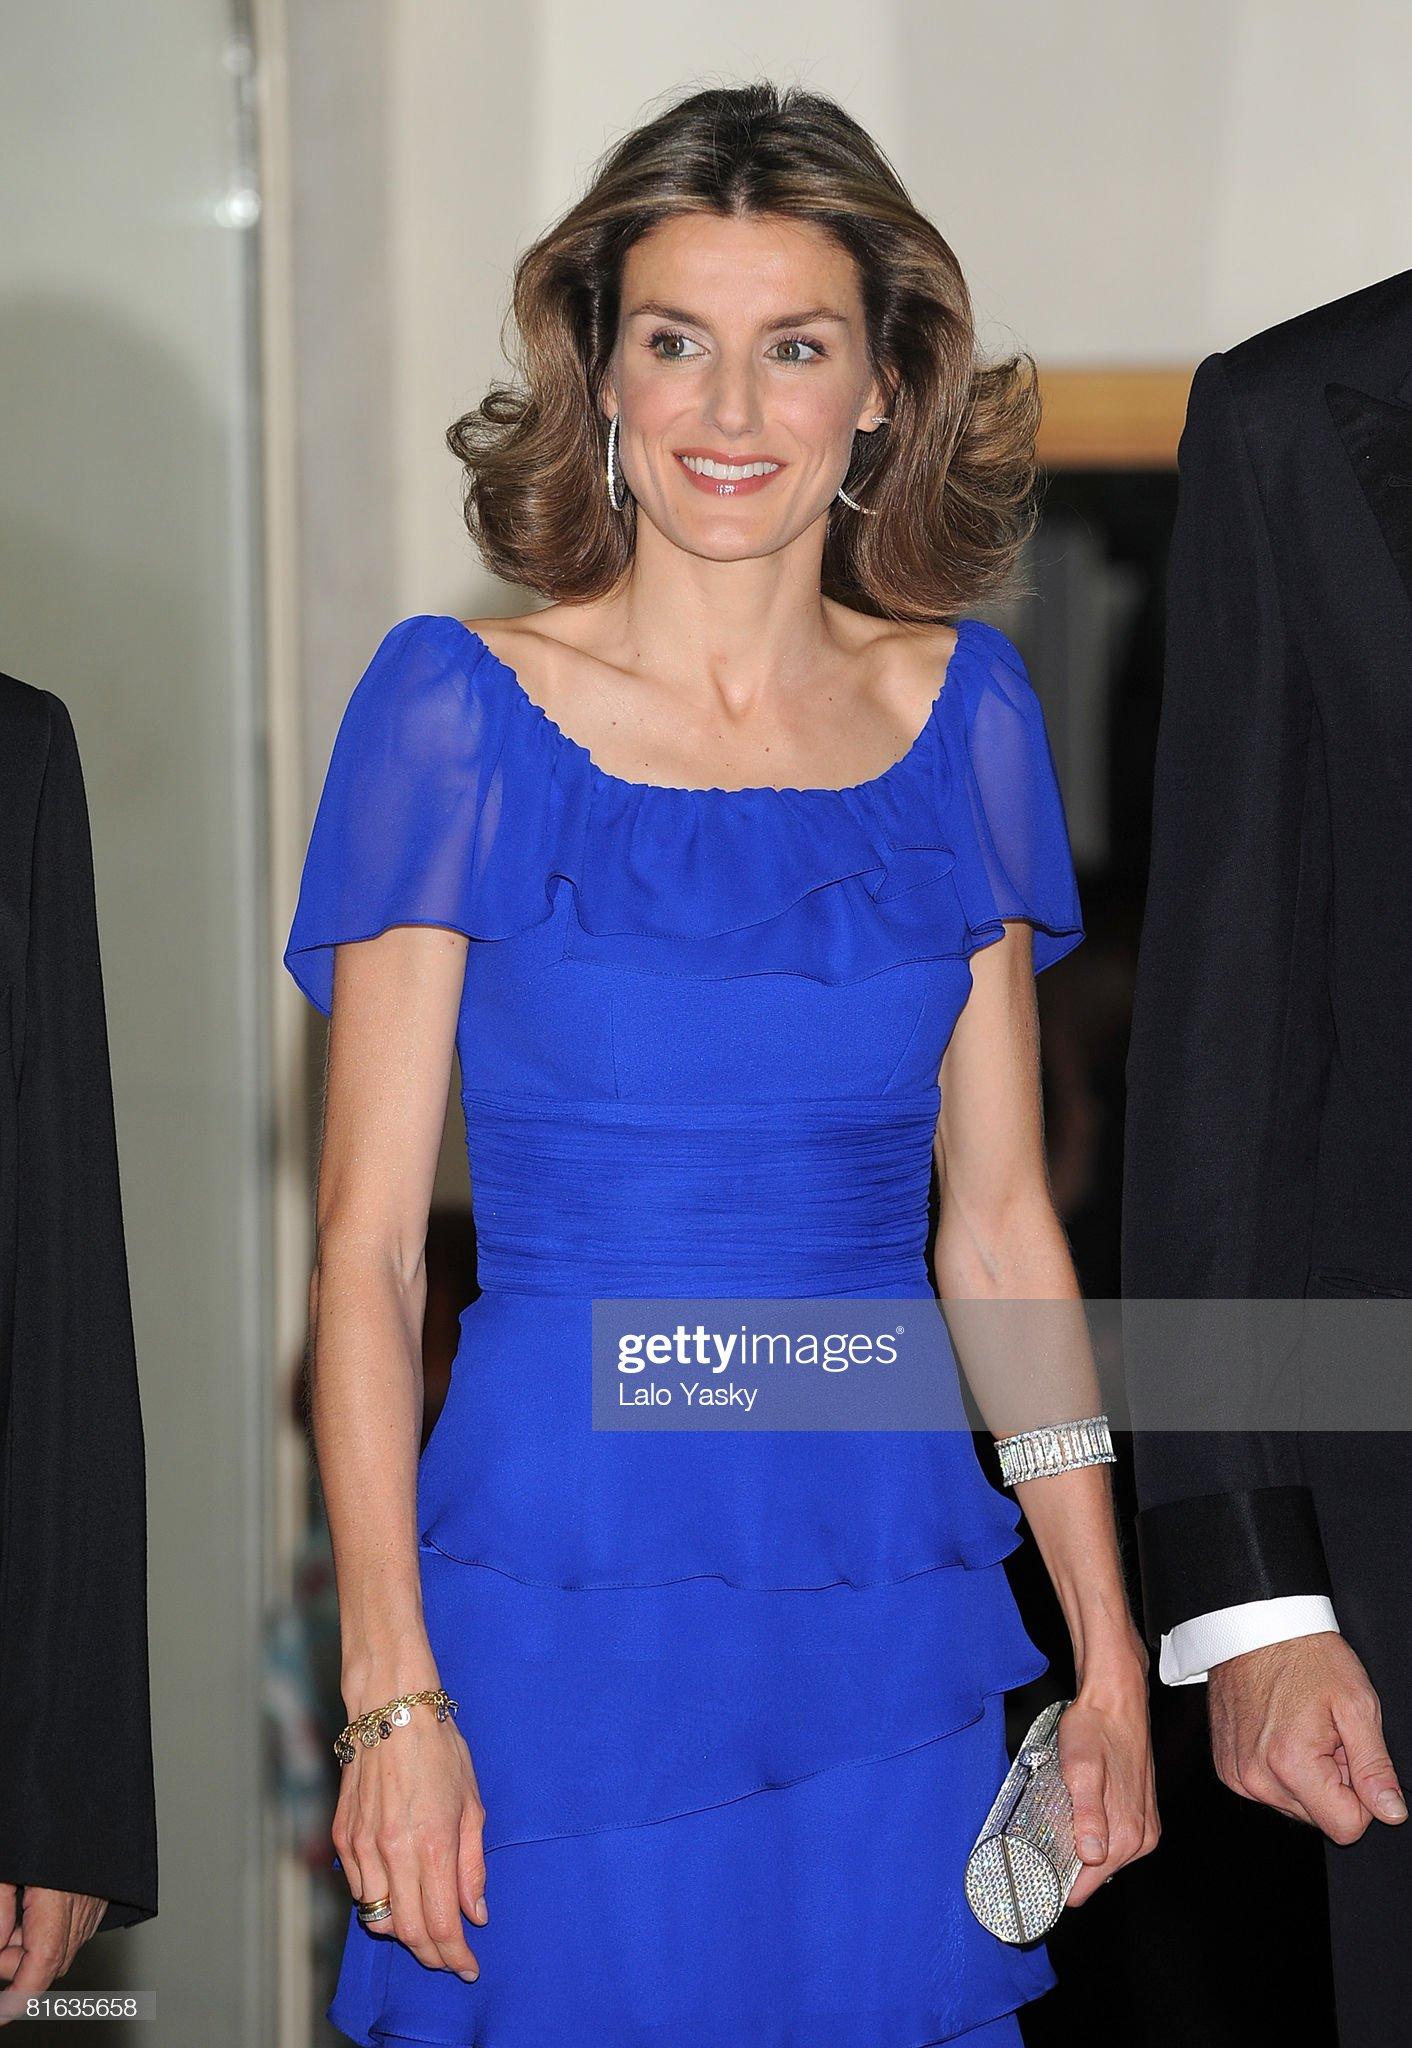 Вечерние наряды Королевы Летиции Prince Felipe and Princess Letizia Host Mingote Awards Gala Dinner : News Photo